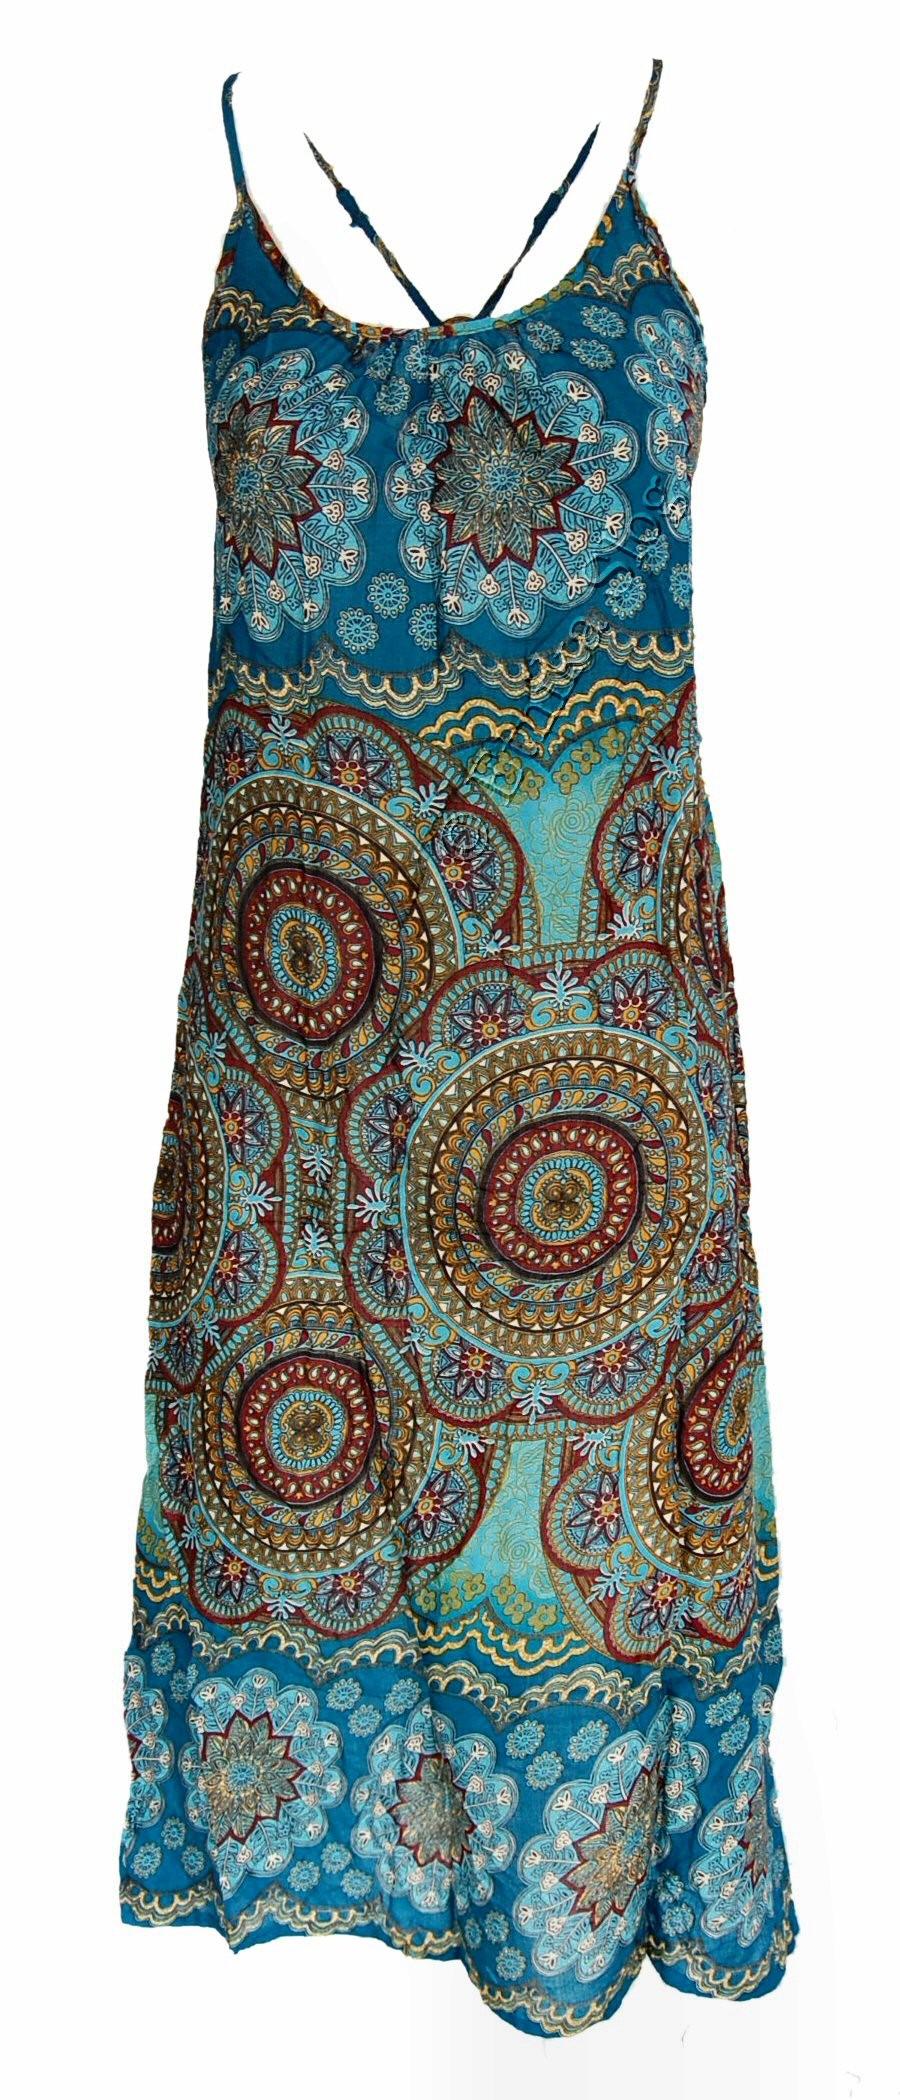 VISCOSE - SUMMER CLOTHING AB-BCV06AB - Oriente Import S.r.l.